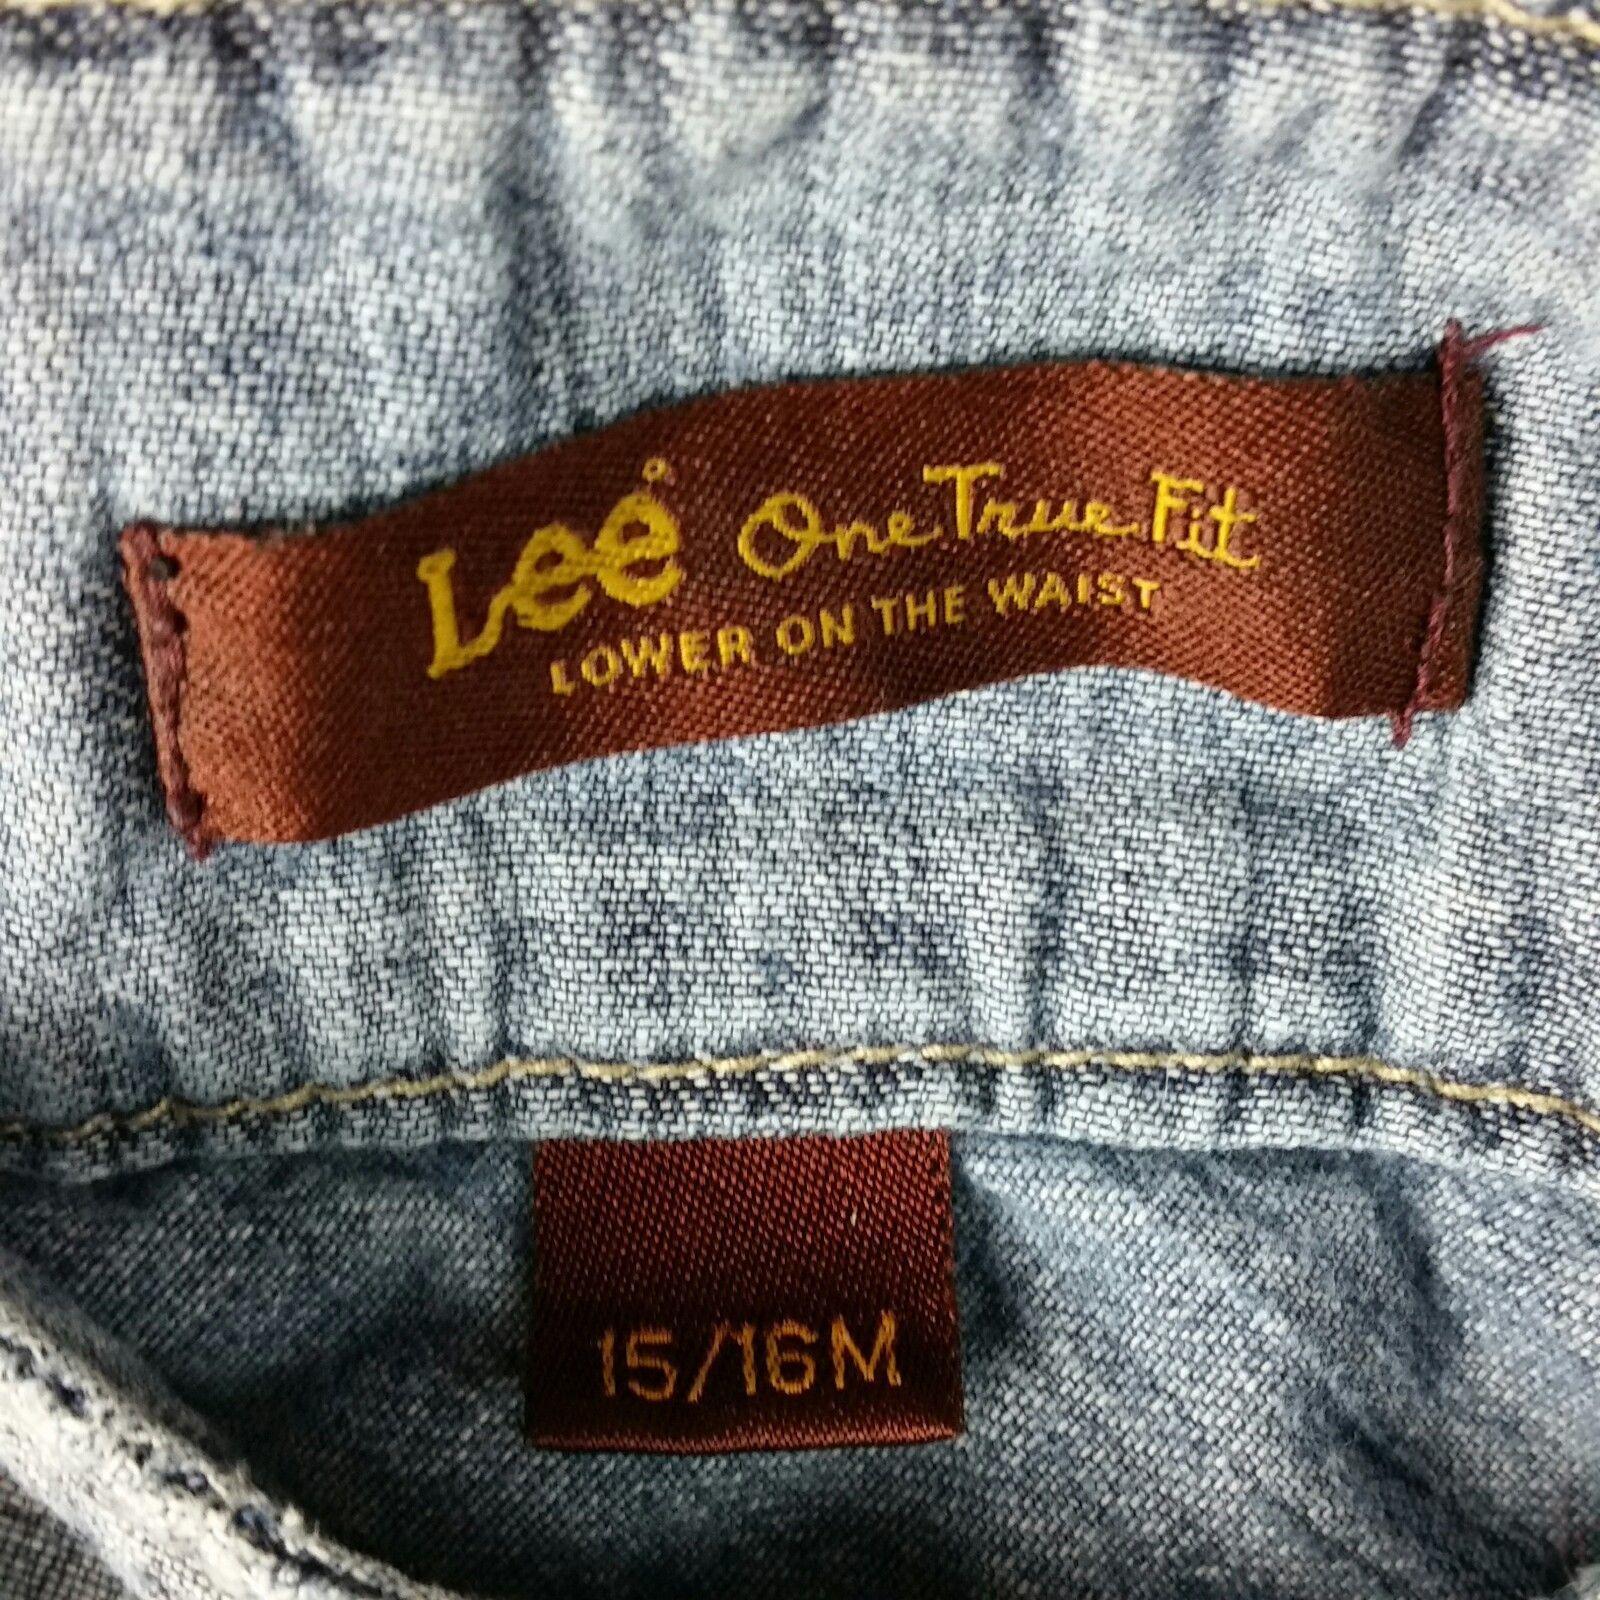 LEE Jean Skirt Womens One True Fit Modest Denim Fringe Hem Size 15/16M image 3